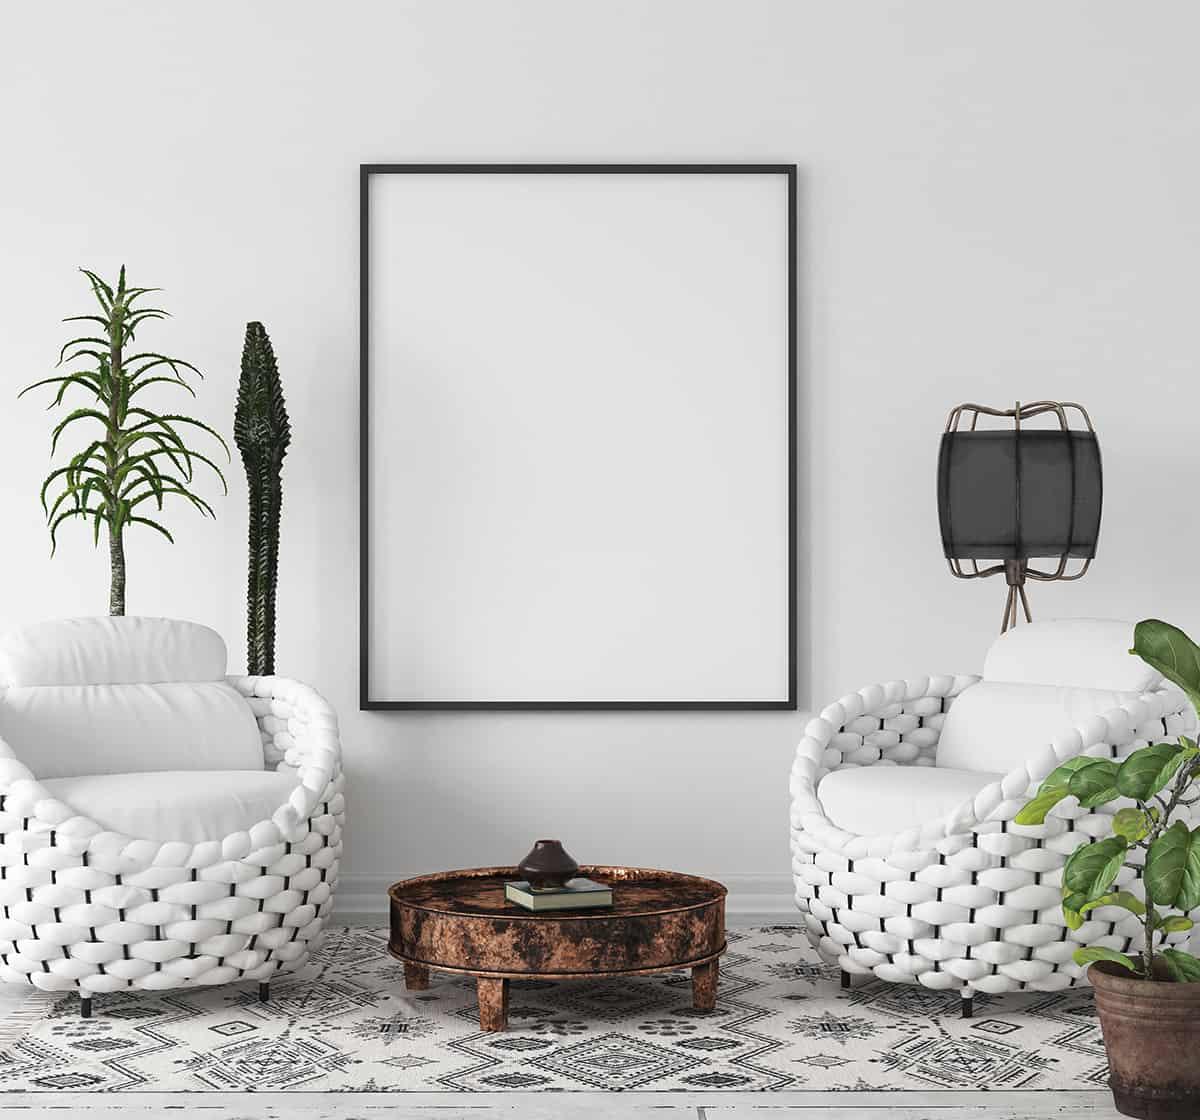 Use Black and White Decor in Boho Theme